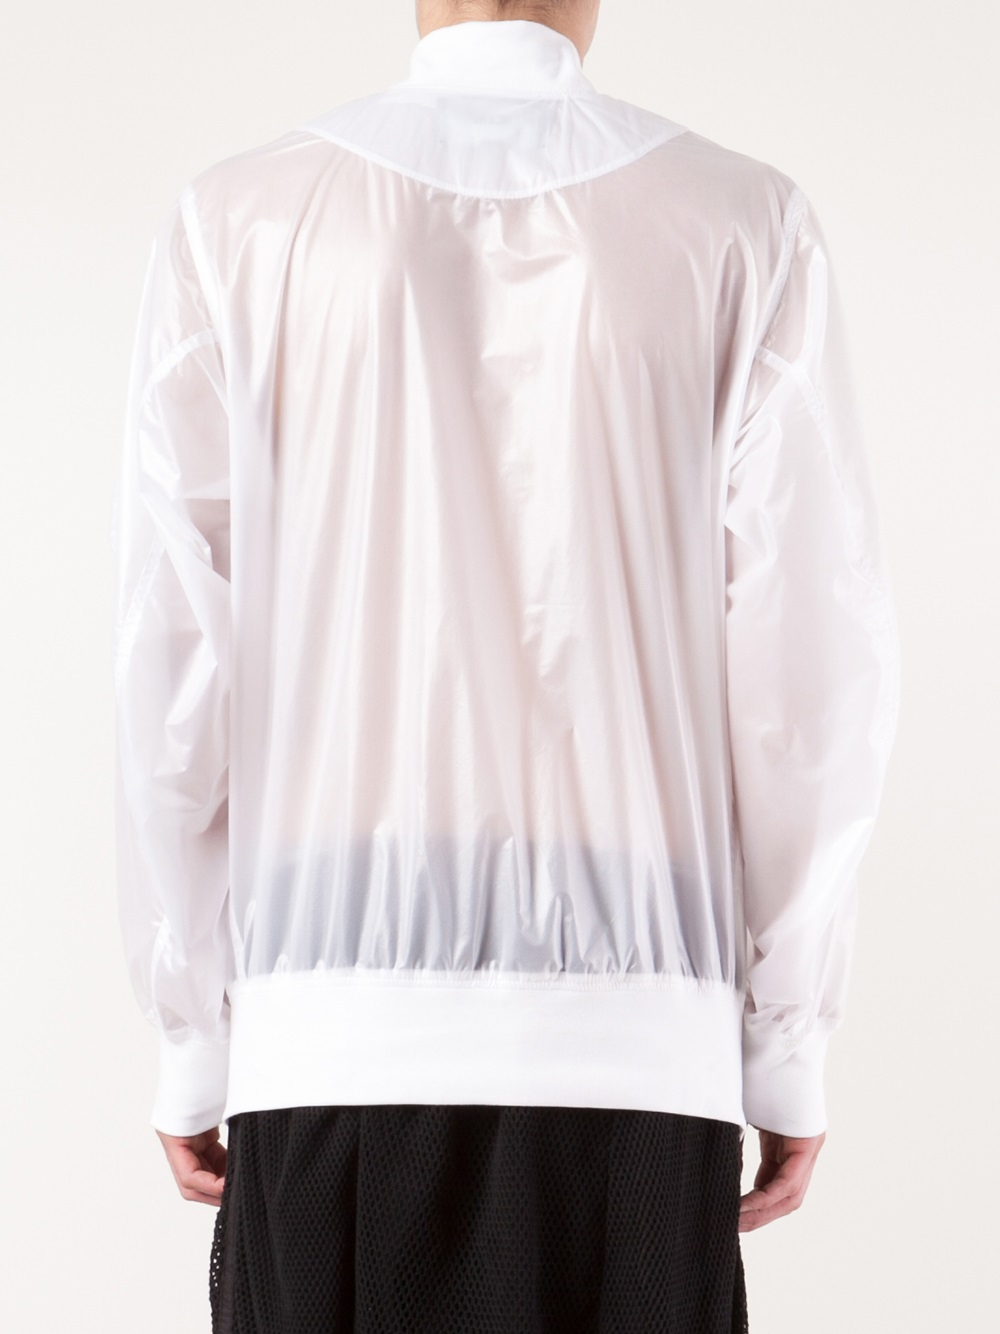 Ariat Mens Shirts